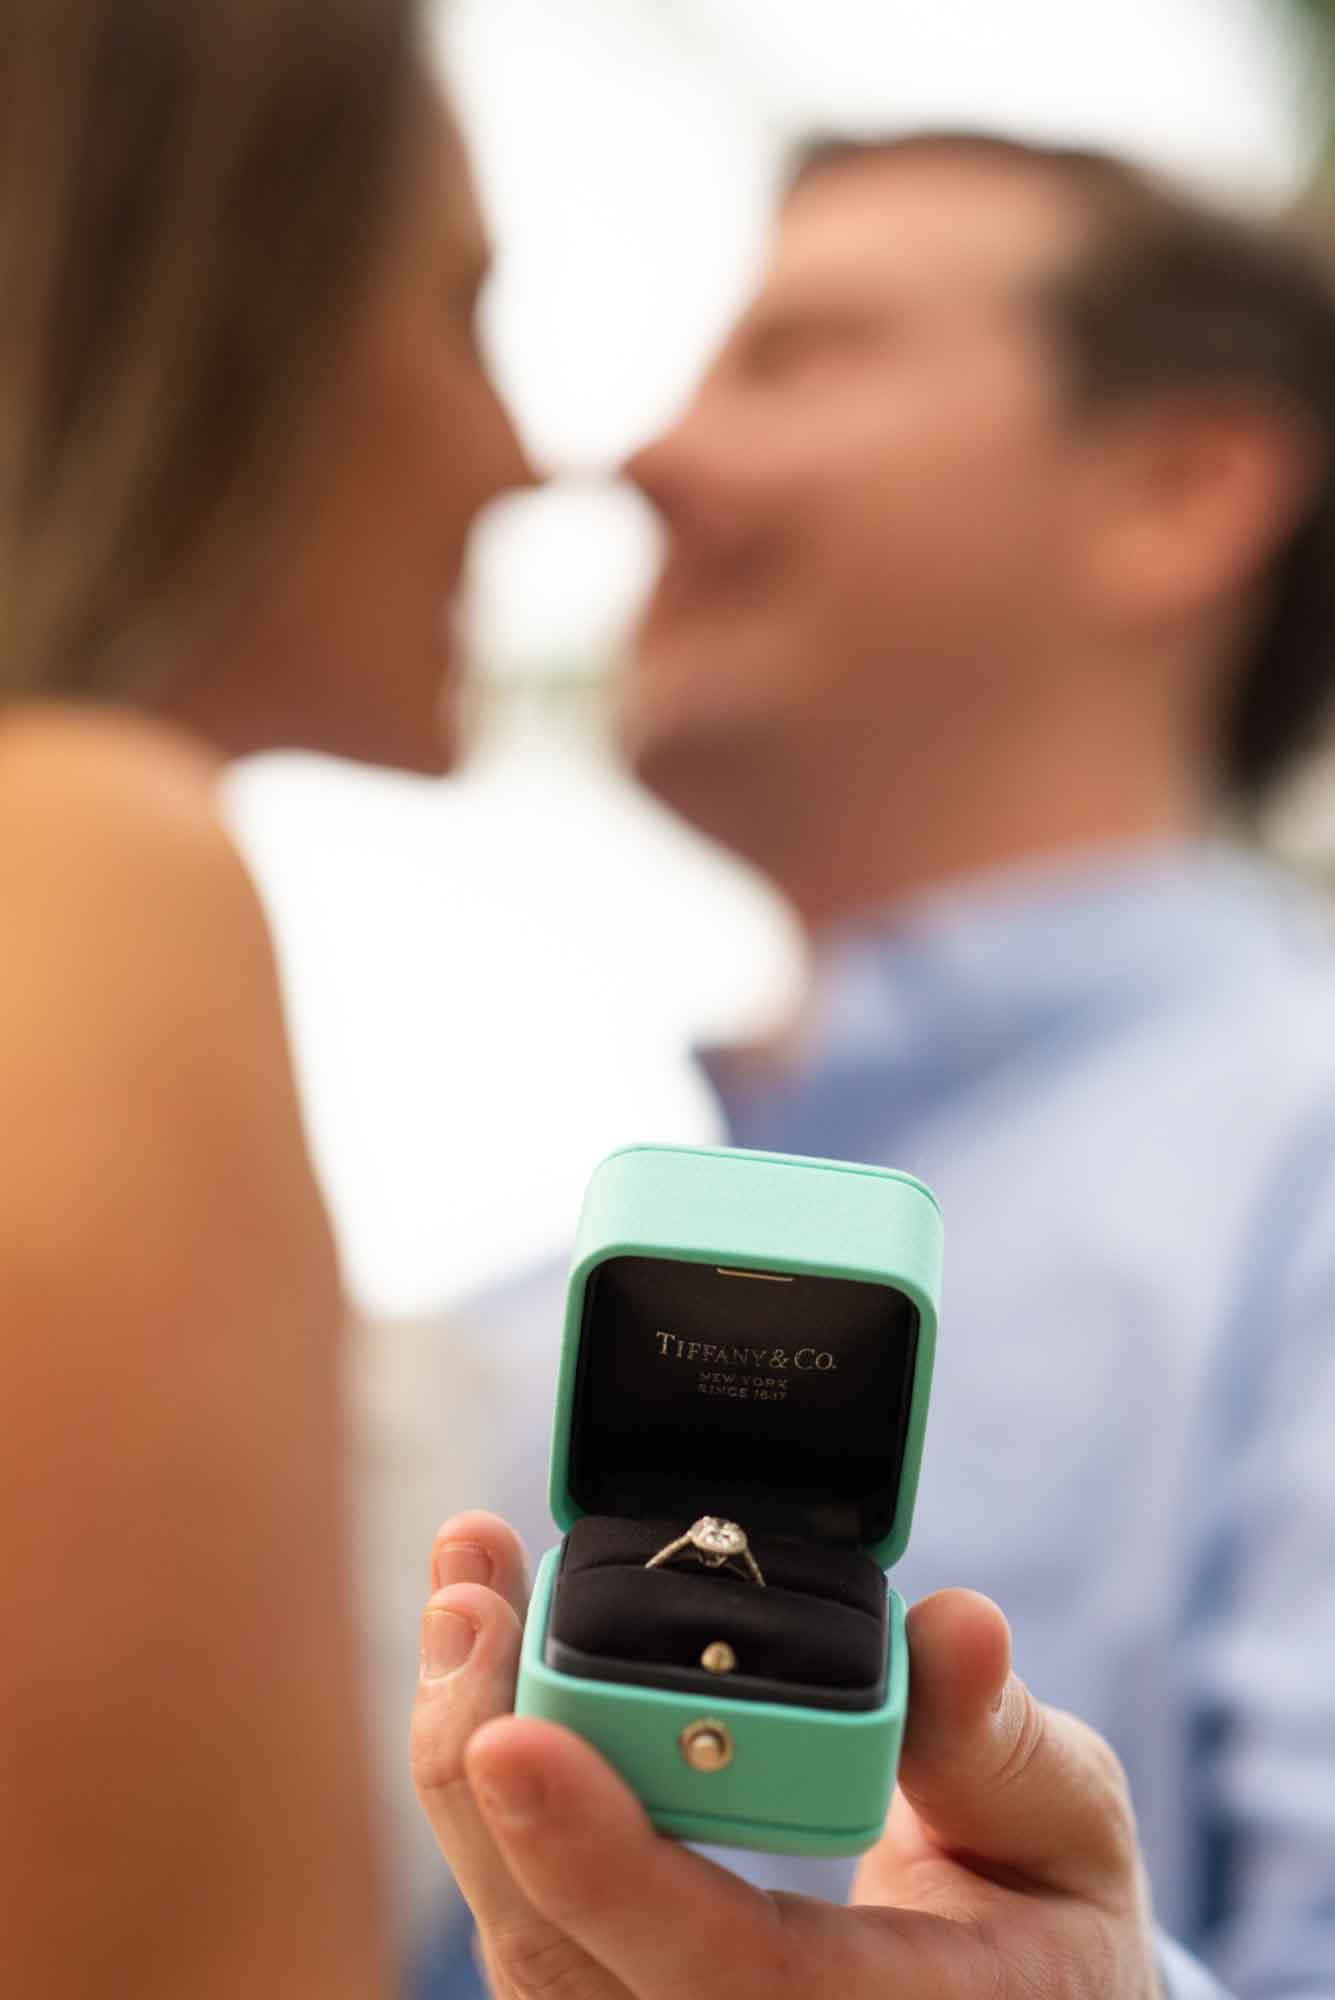 Weddings-Engagements-Jamie-Levine-Photography-NYC-23.jpg